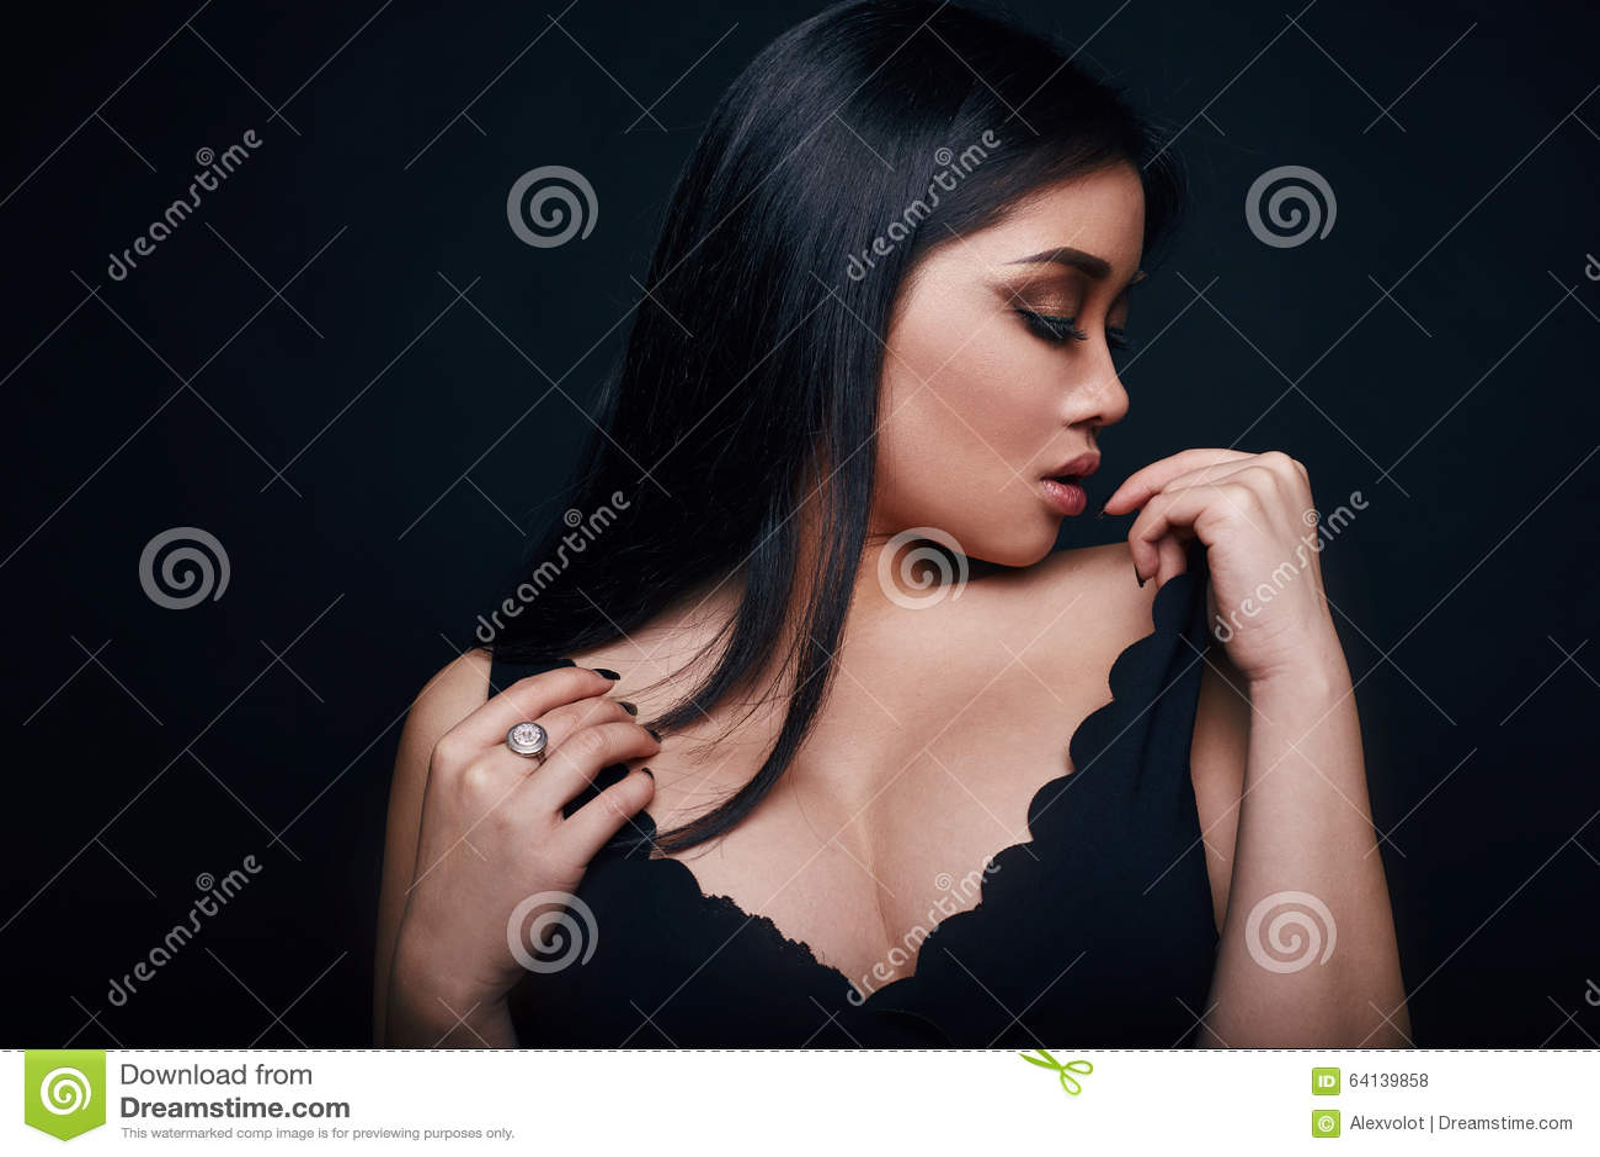 df6cc943457b Fashion swag portrait of beautiful elegant asian woman in formal dress on black  background